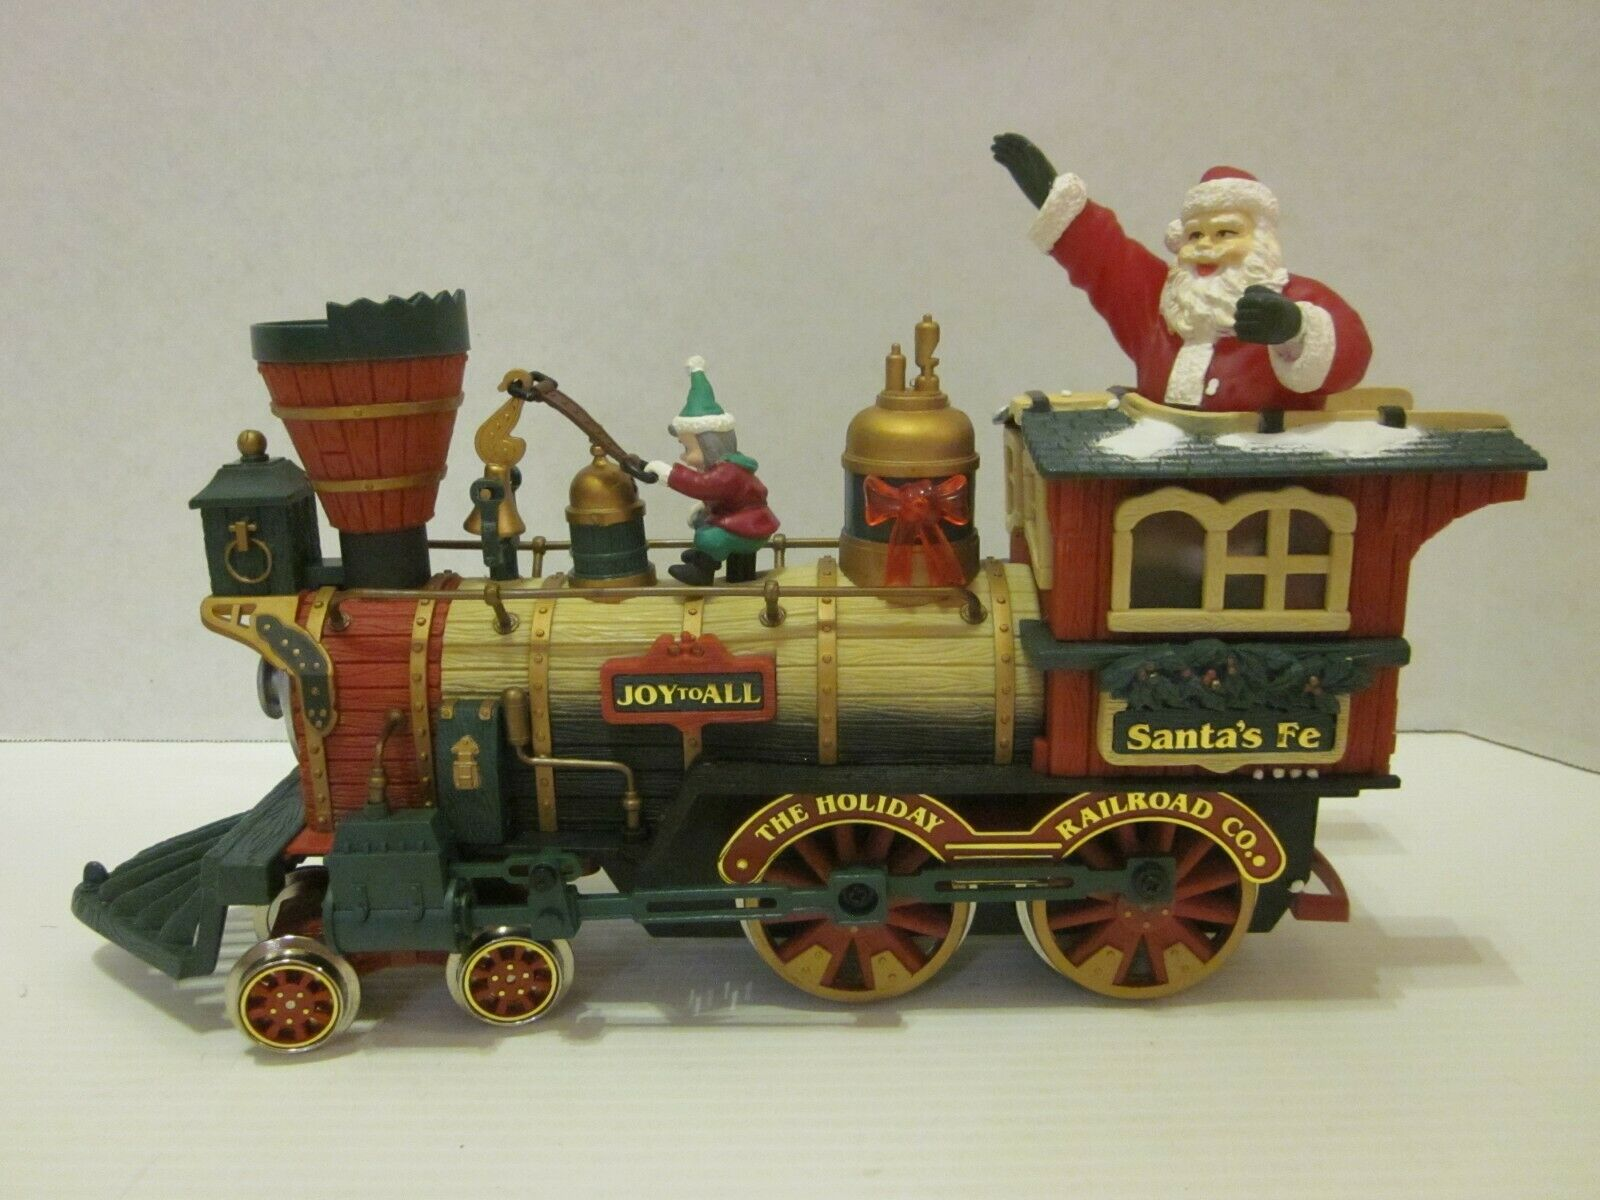 New Bright Holiday Express Locomotive Engine 387 384 Train Santa's Fe Animated G